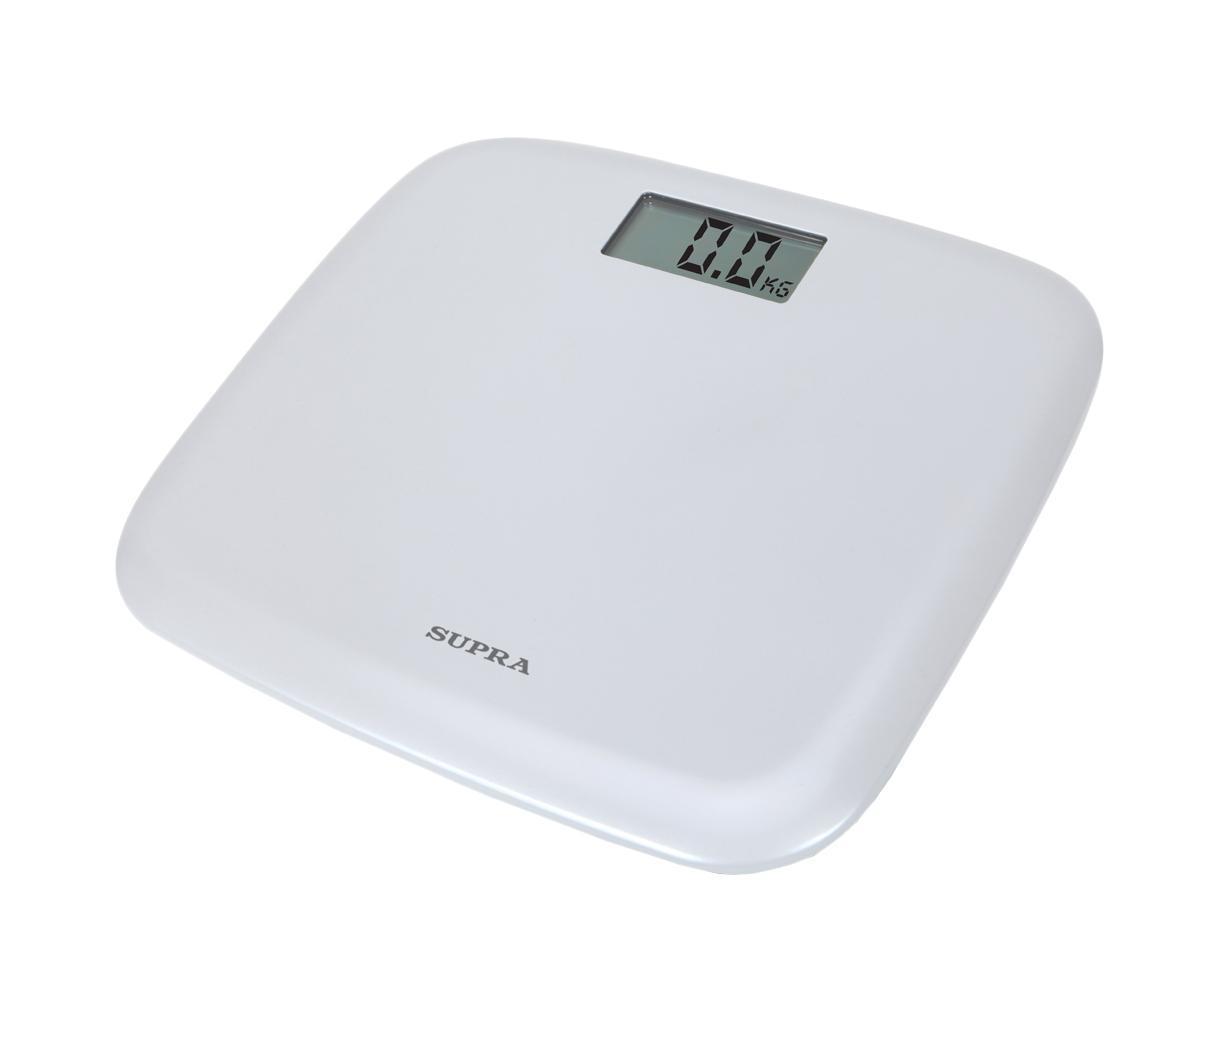 Supra BSS-6050, White напольные весы